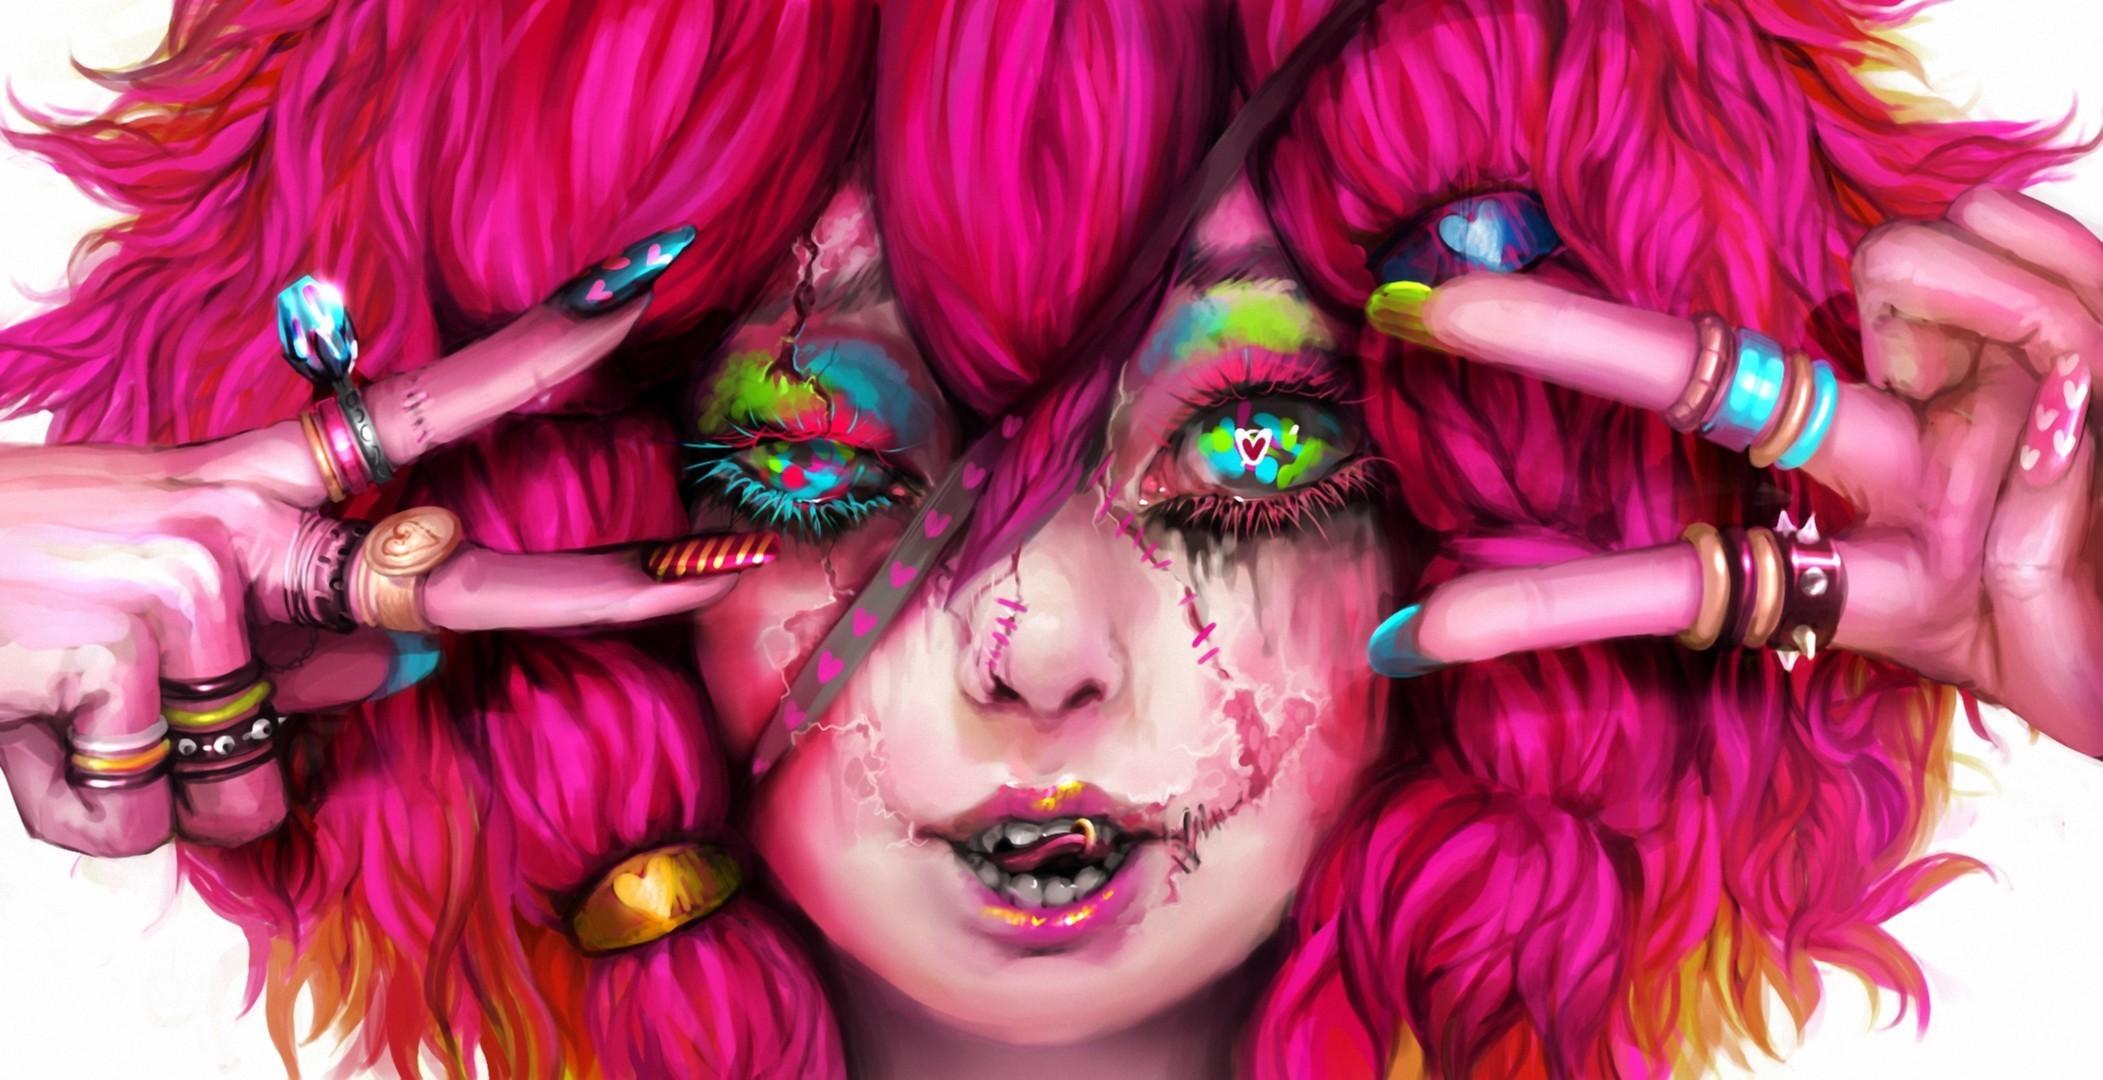 Pink Haired Wool Doll Devil Scars Colorful Eyes Genki-de